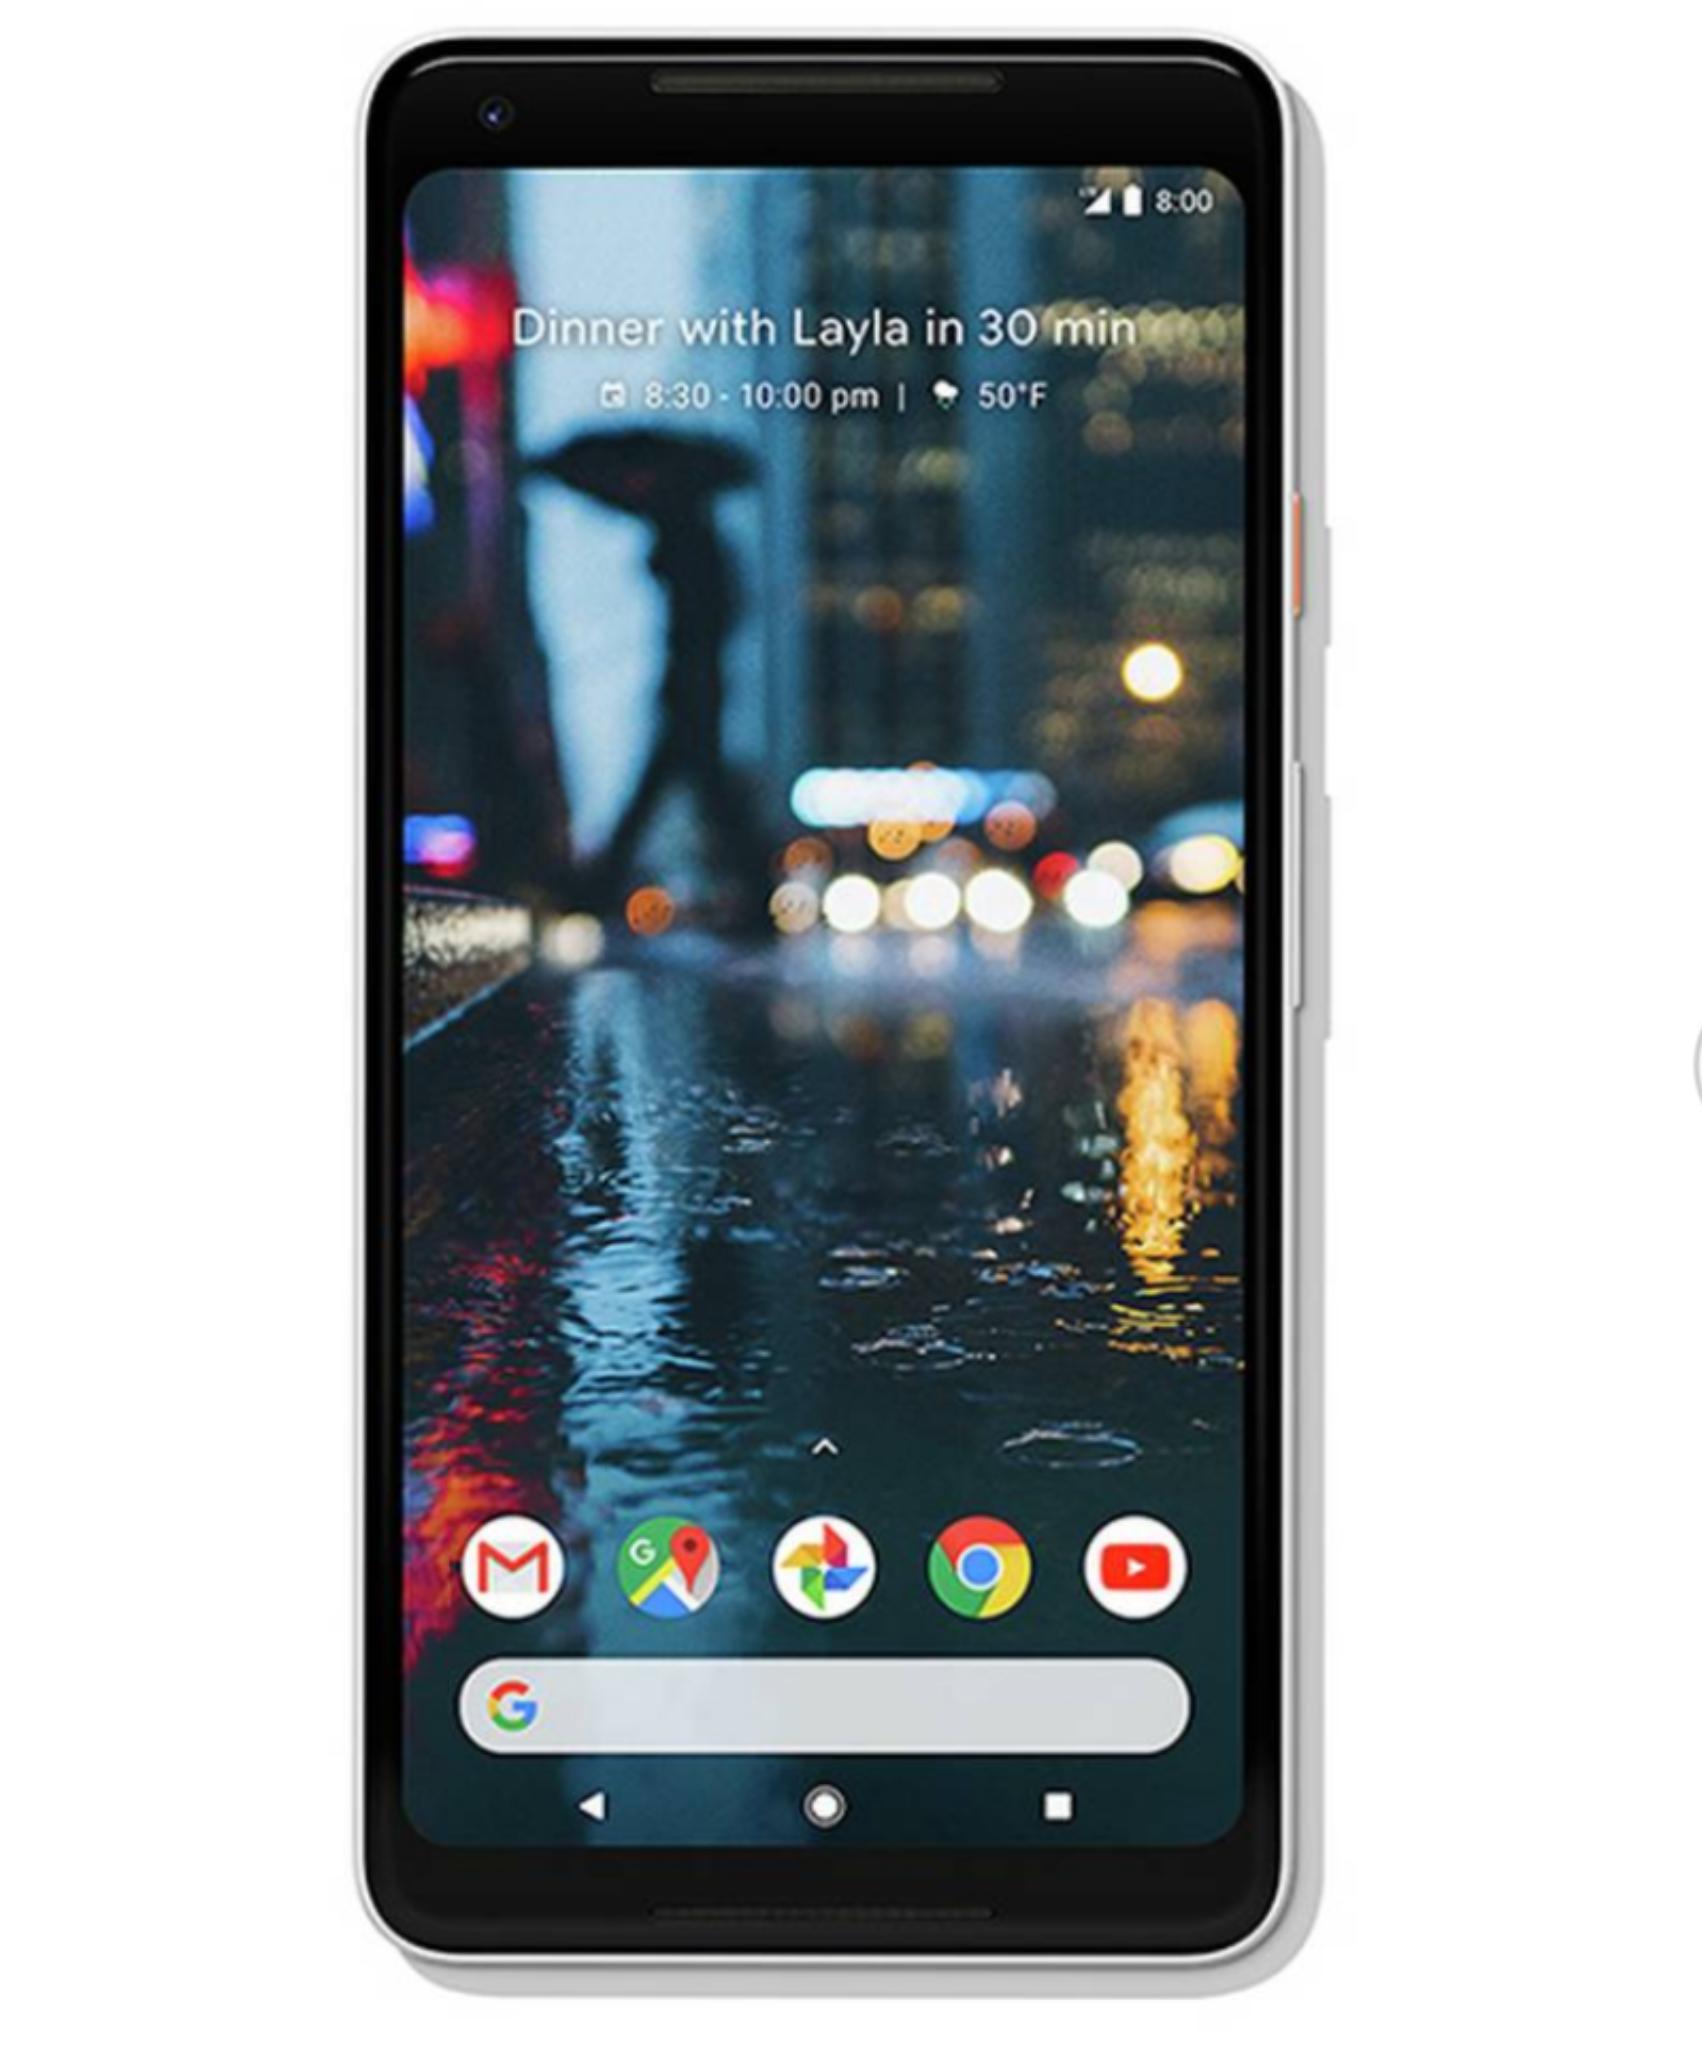 SIM Free Google Pixel 2 XL 128GB Mobile Phone - White - £349.95 @ Argos